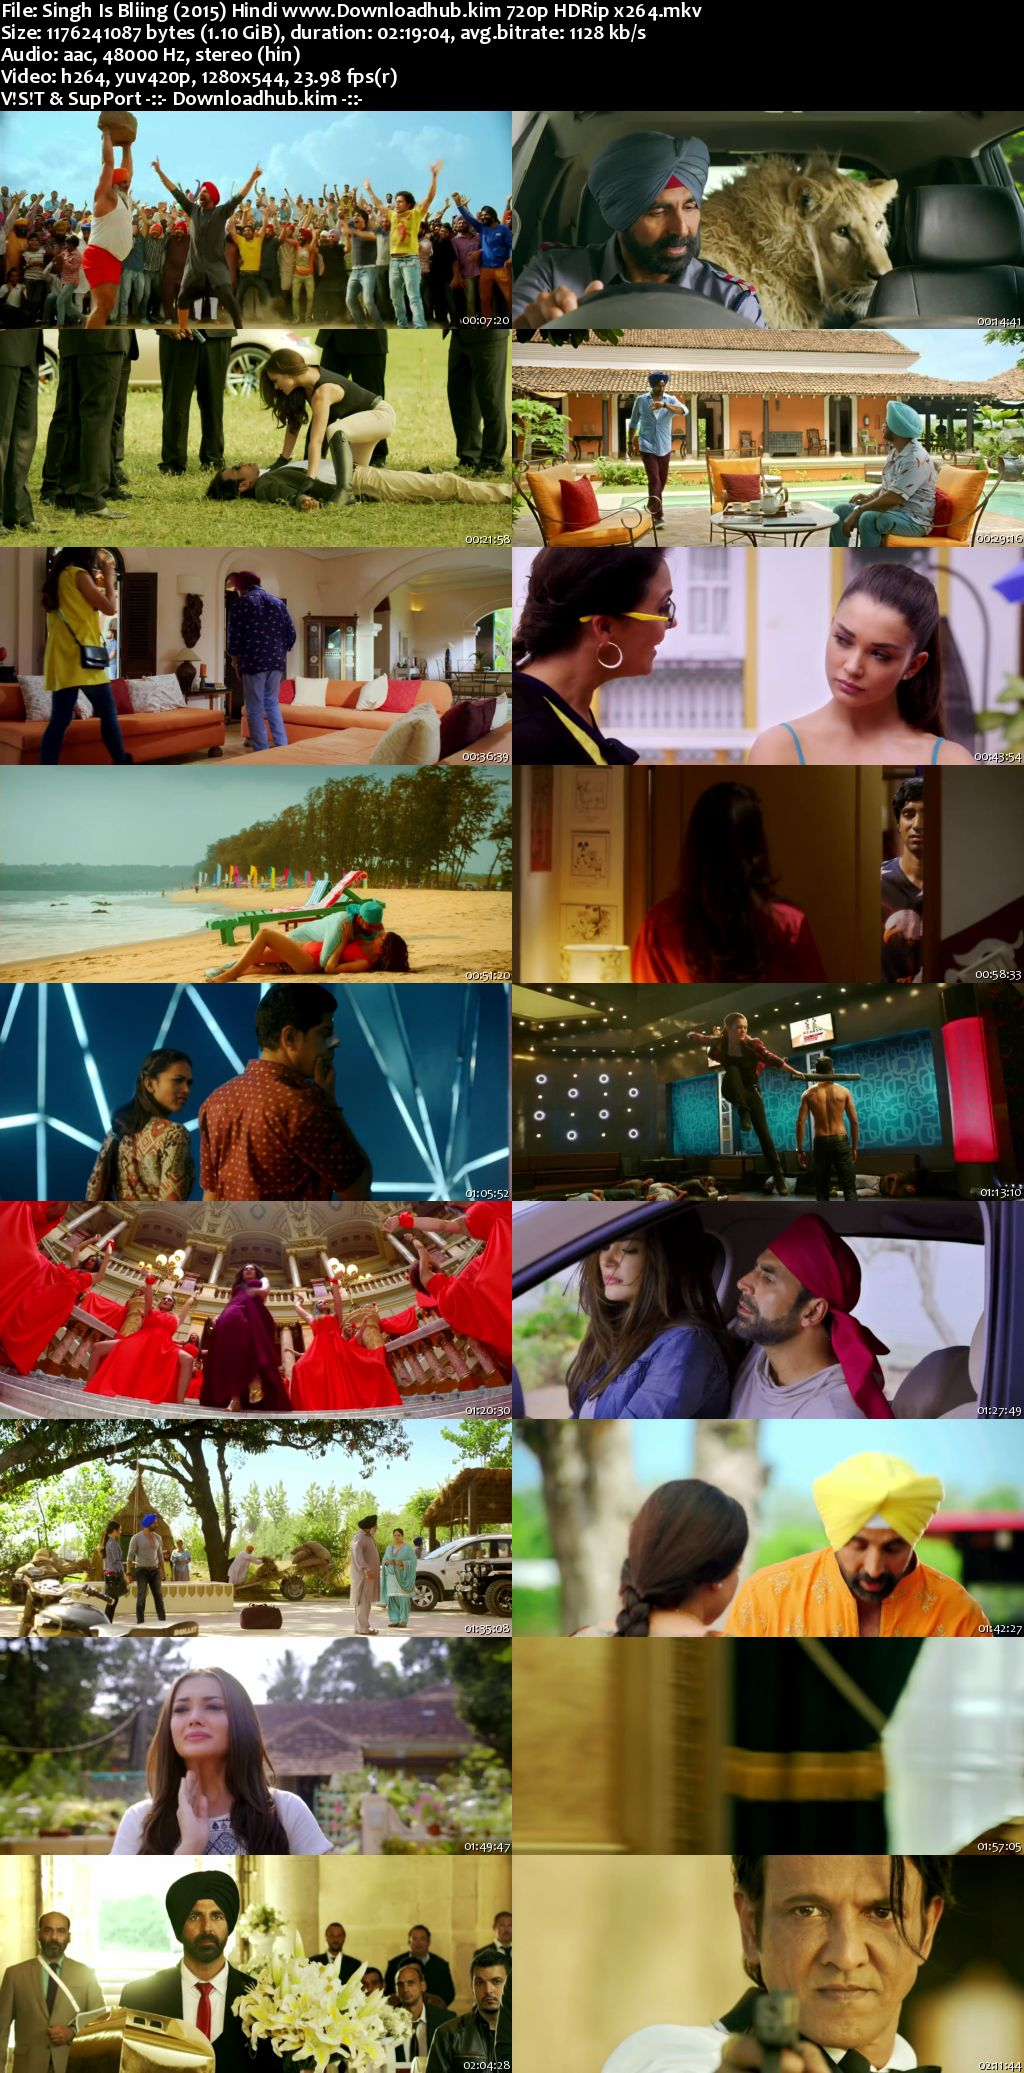 Singh Is Bliing 2015 Hindi 720p HDRip x264